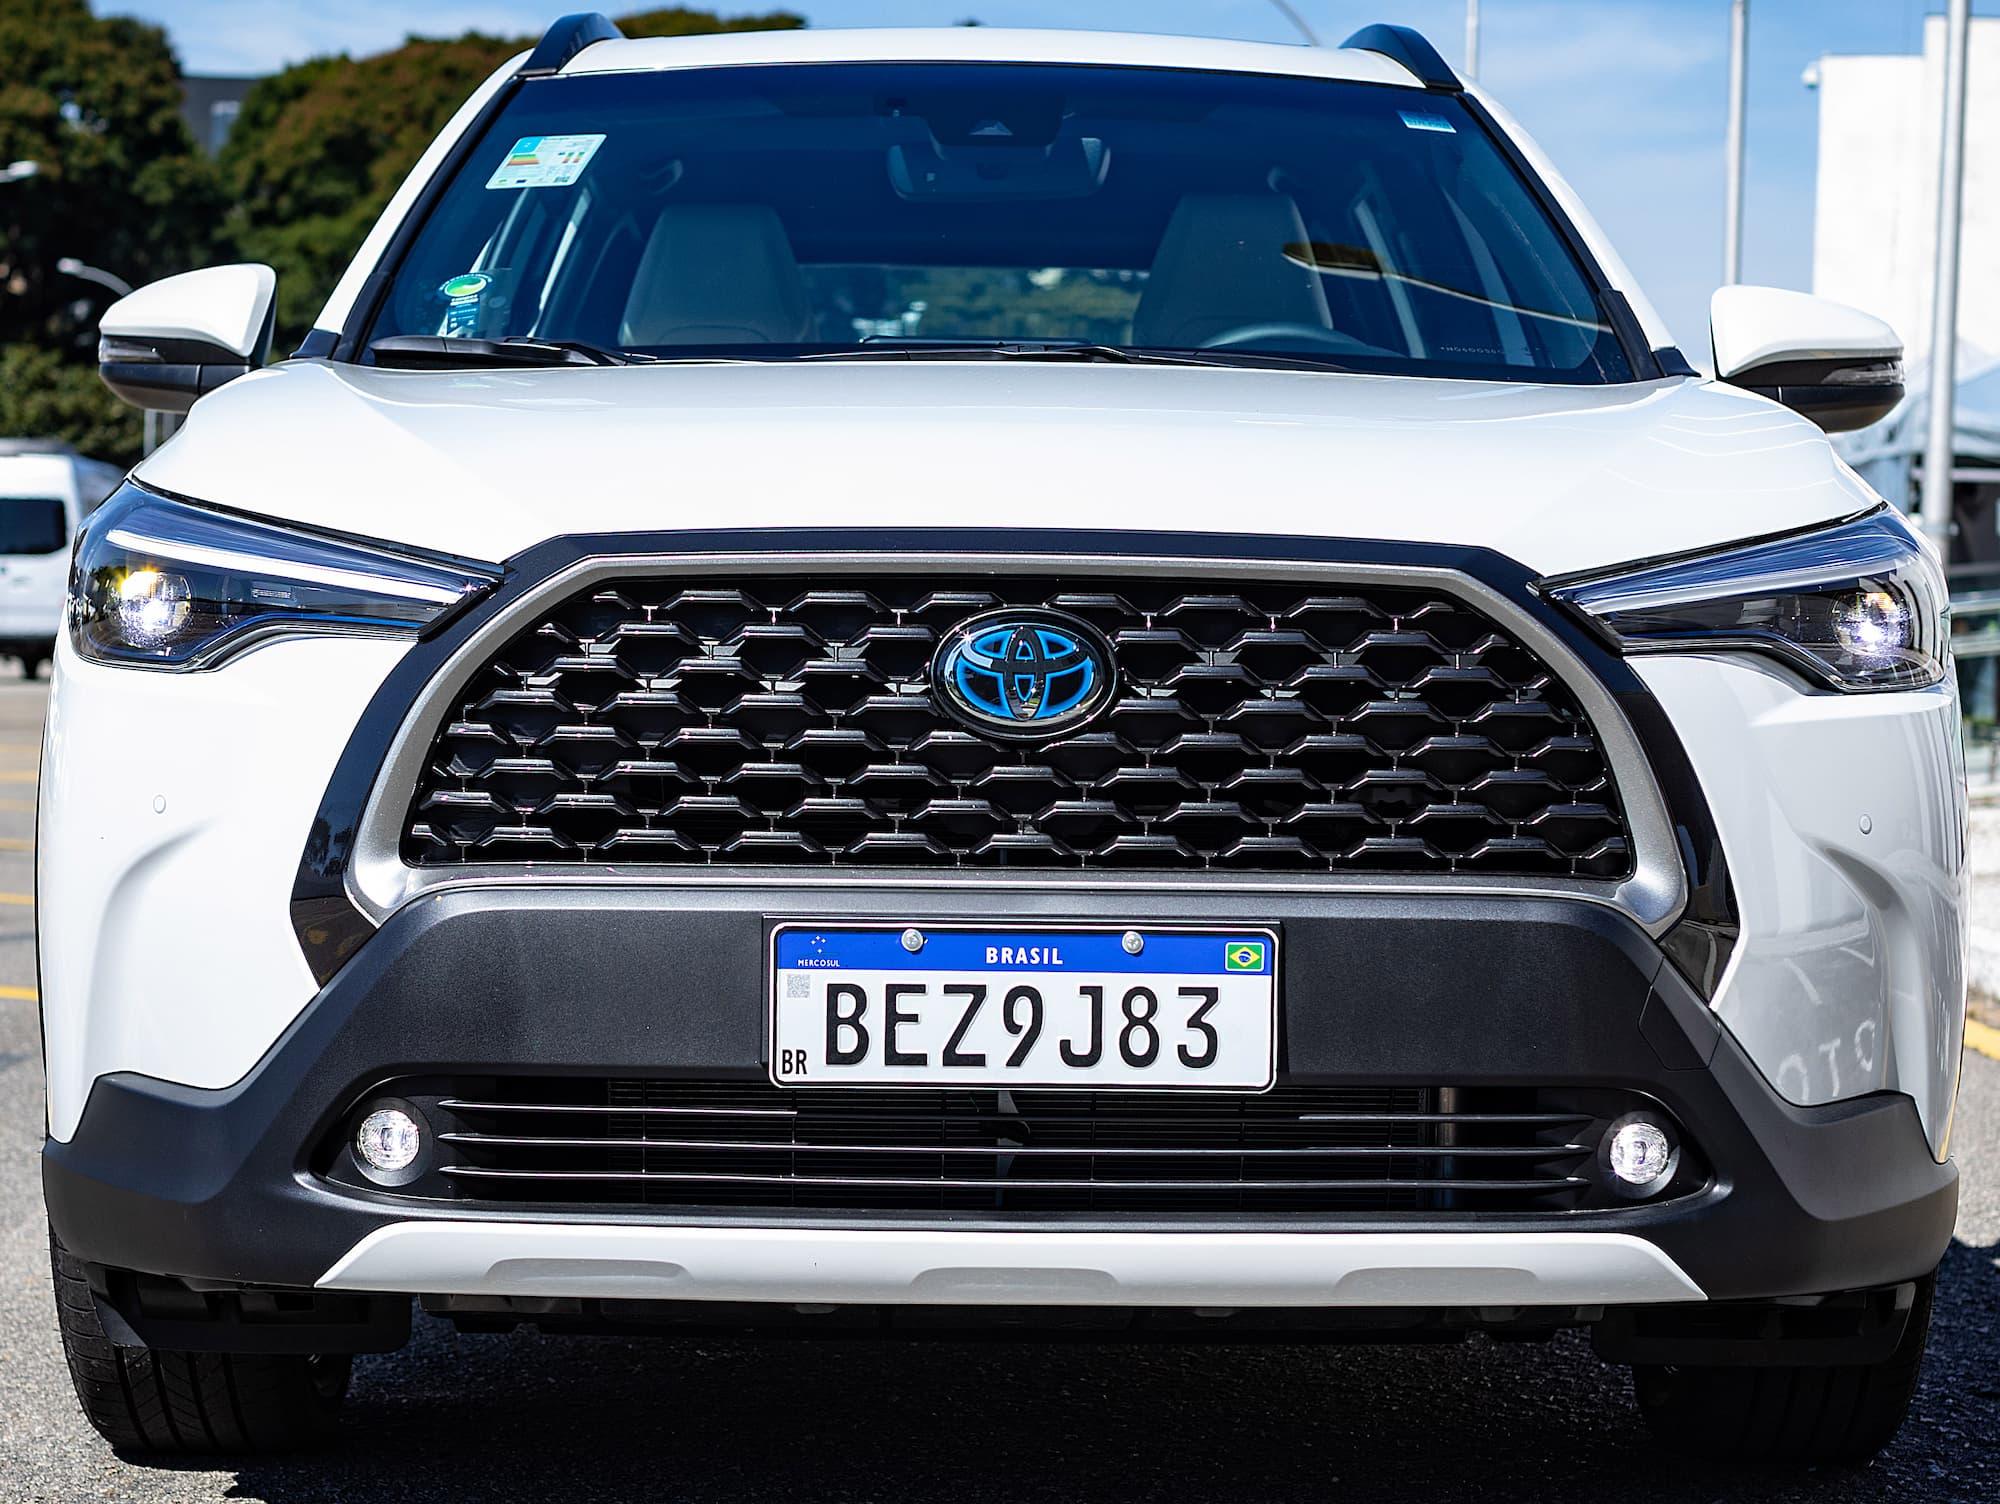 Avaliamos o Toyota Corolla Cross 1.8 híbrido  flex